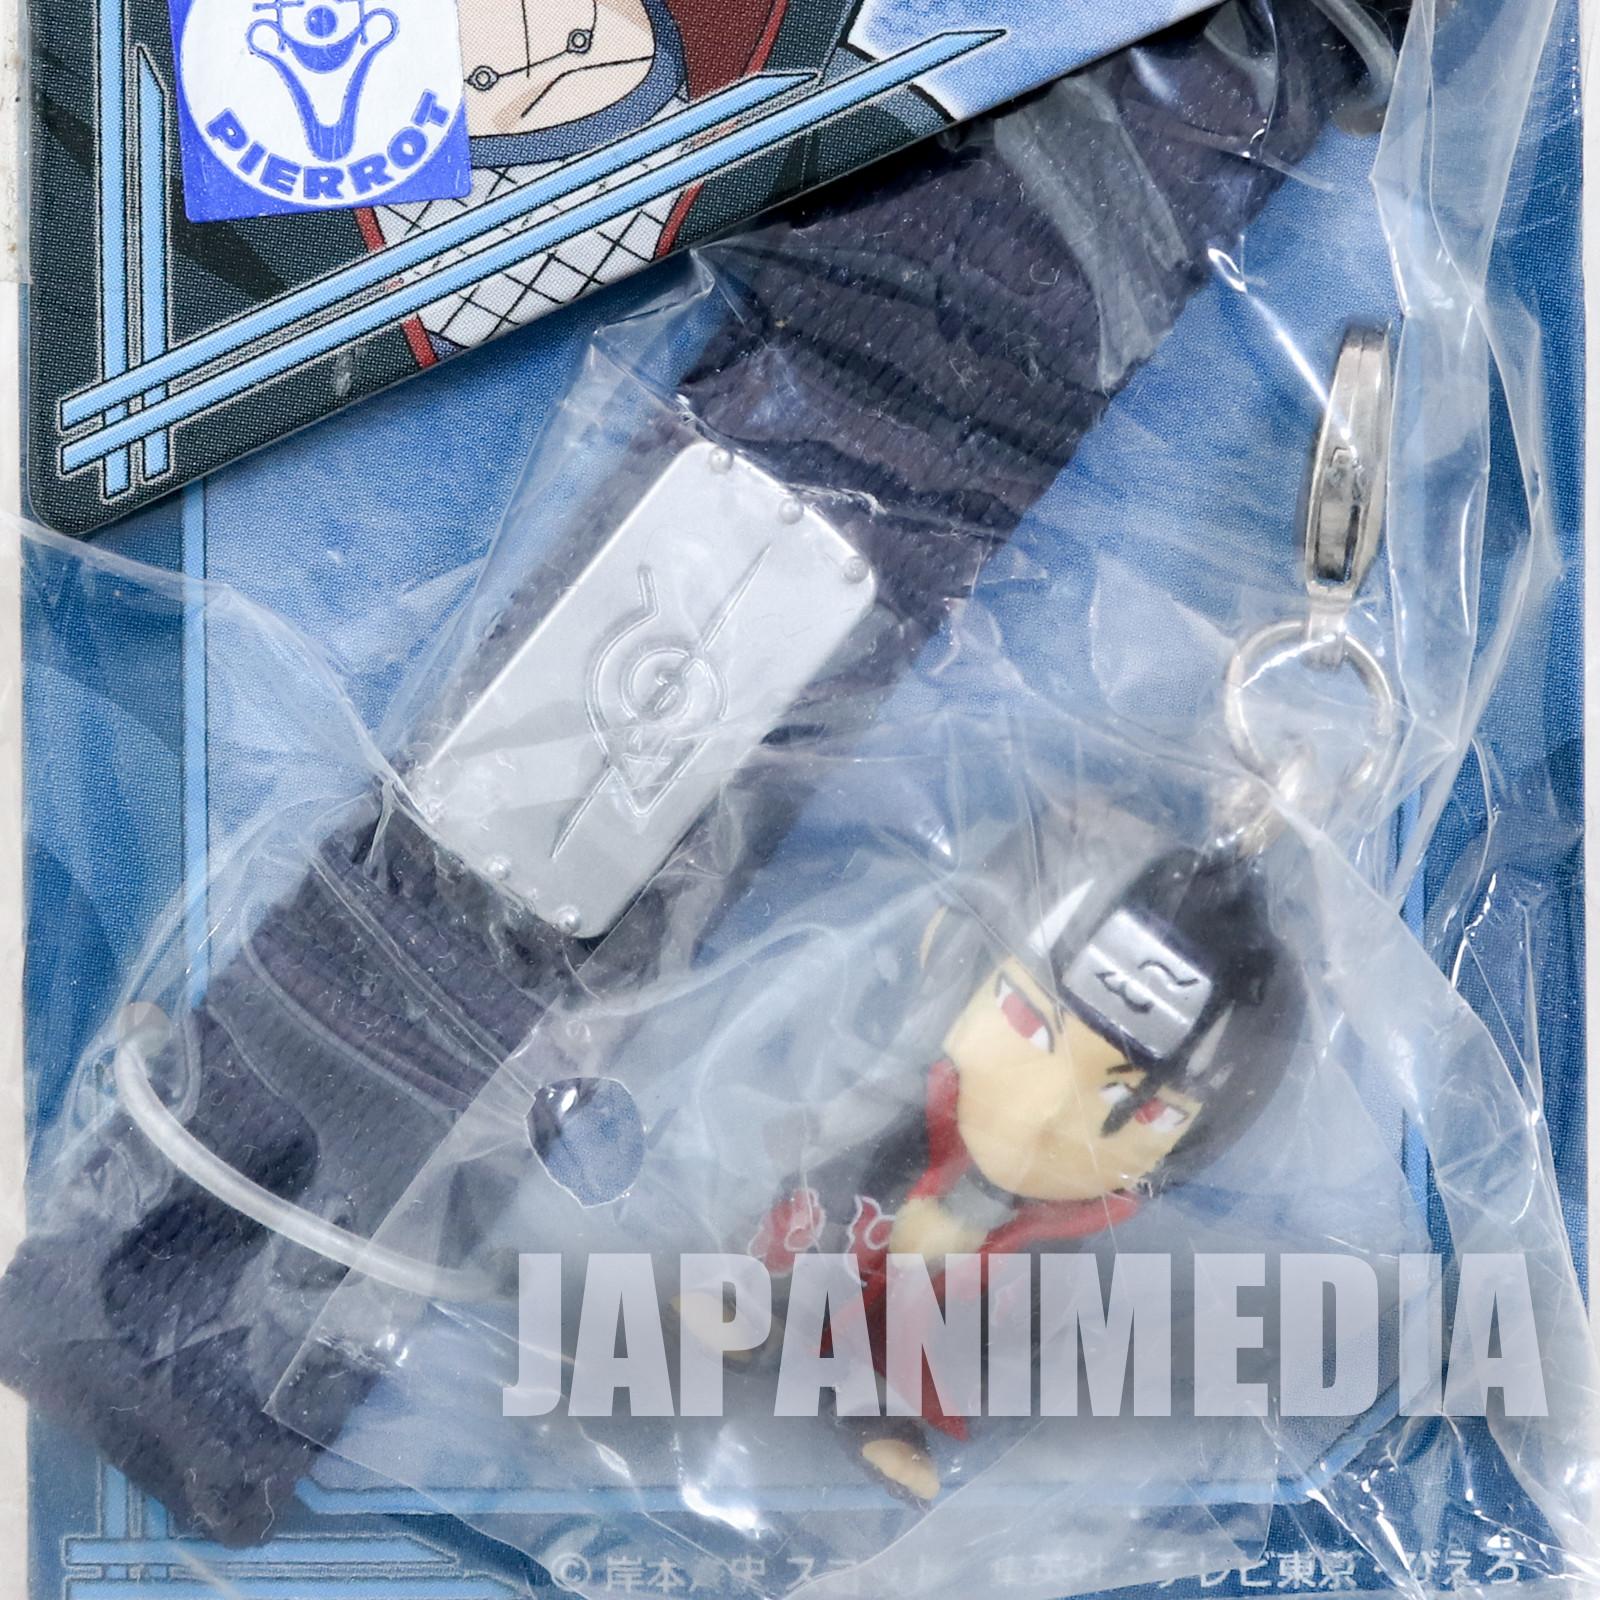 NARUTO Sasuke Uchiha Figure Strap Banpresto JAPAN ANIME MANGA